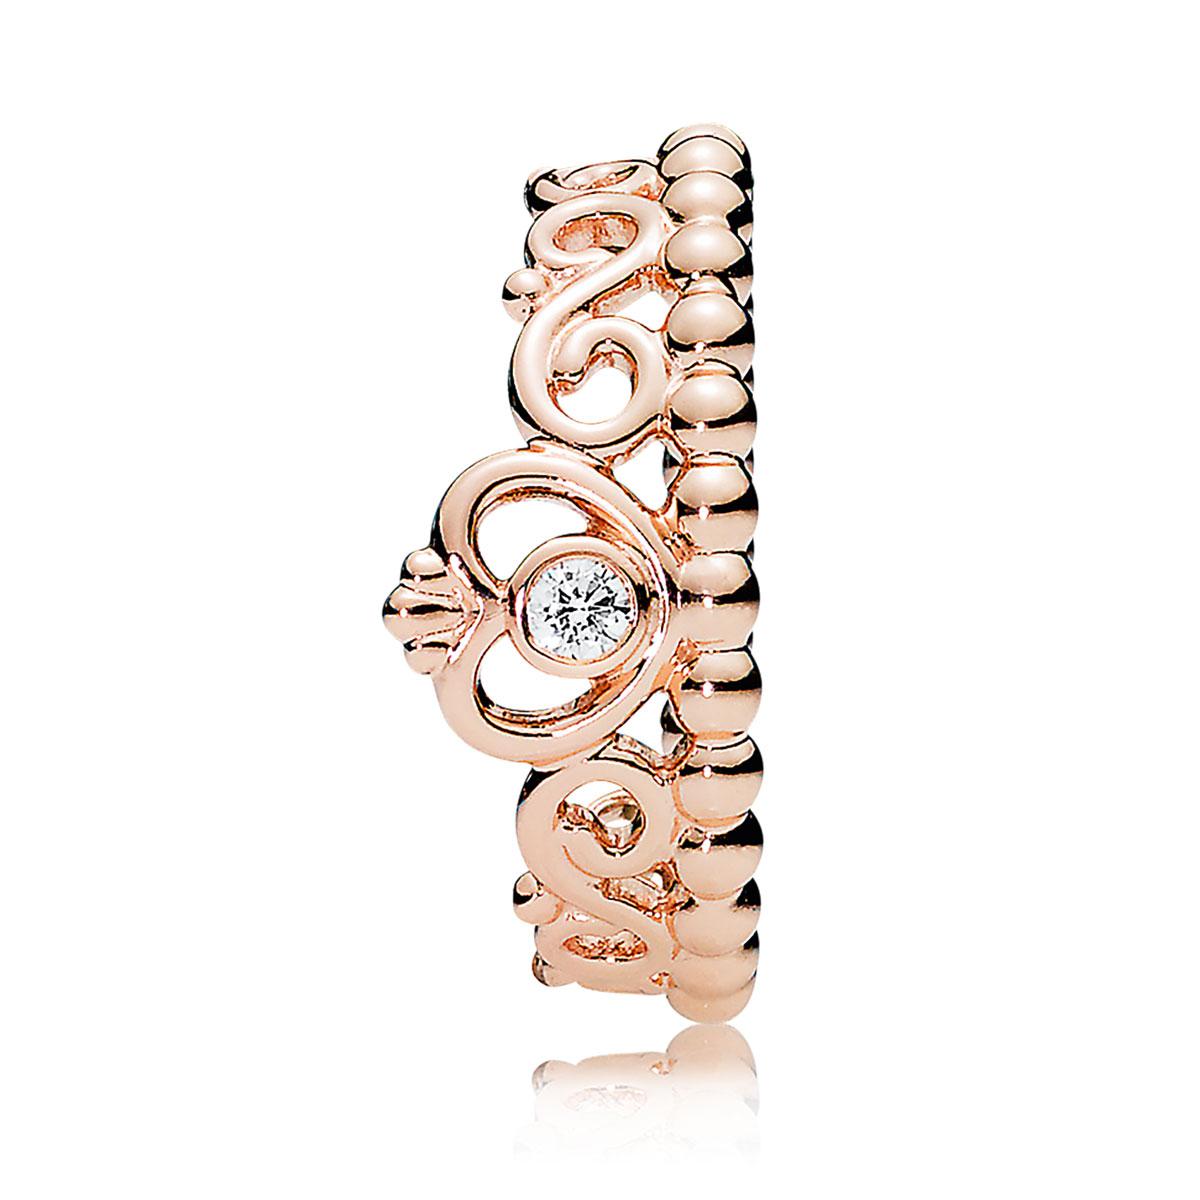 pandora rose gold ring pandora jewelry website. Black Bedroom Furniture Sets. Home Design Ideas